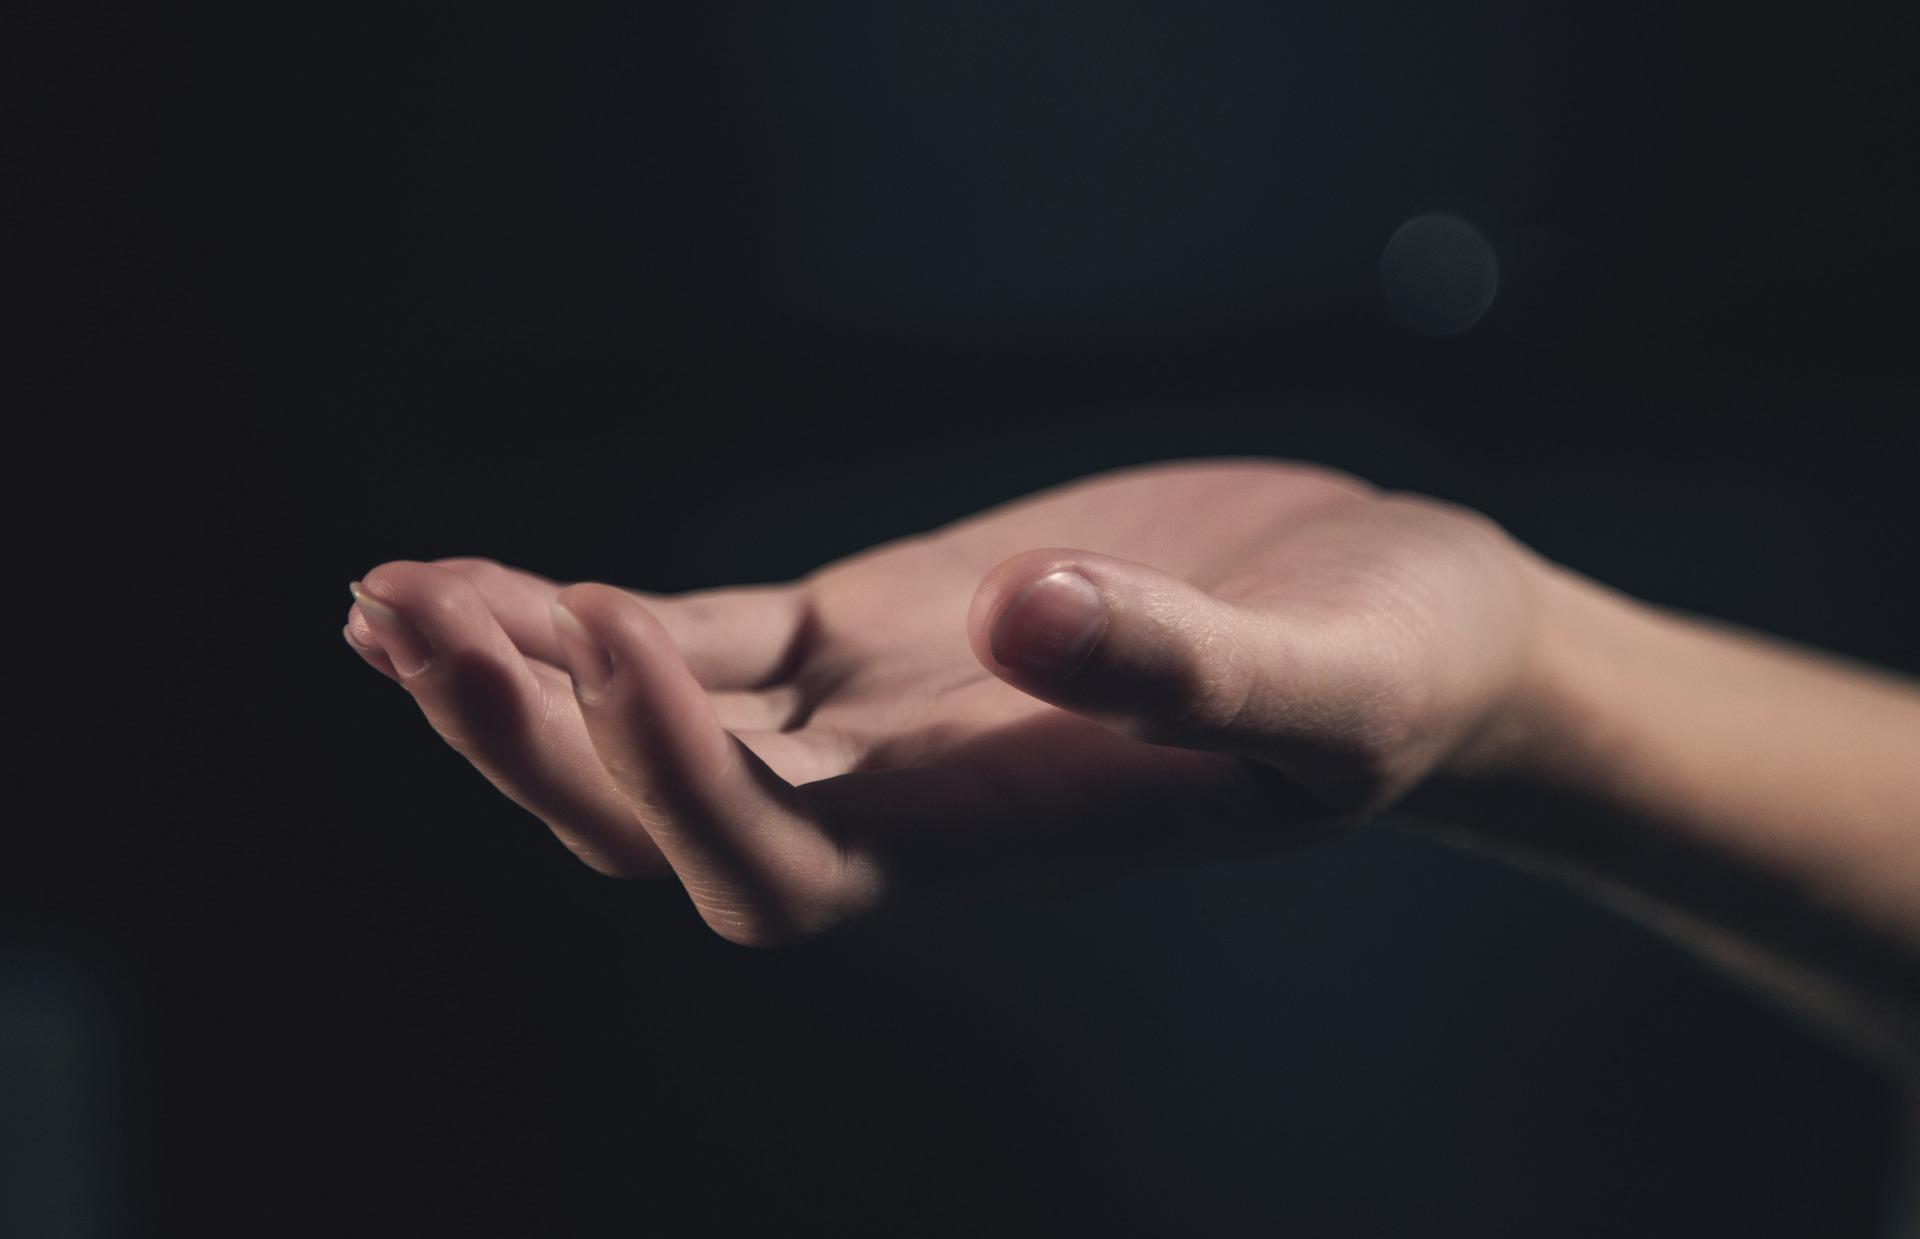 hand, skin